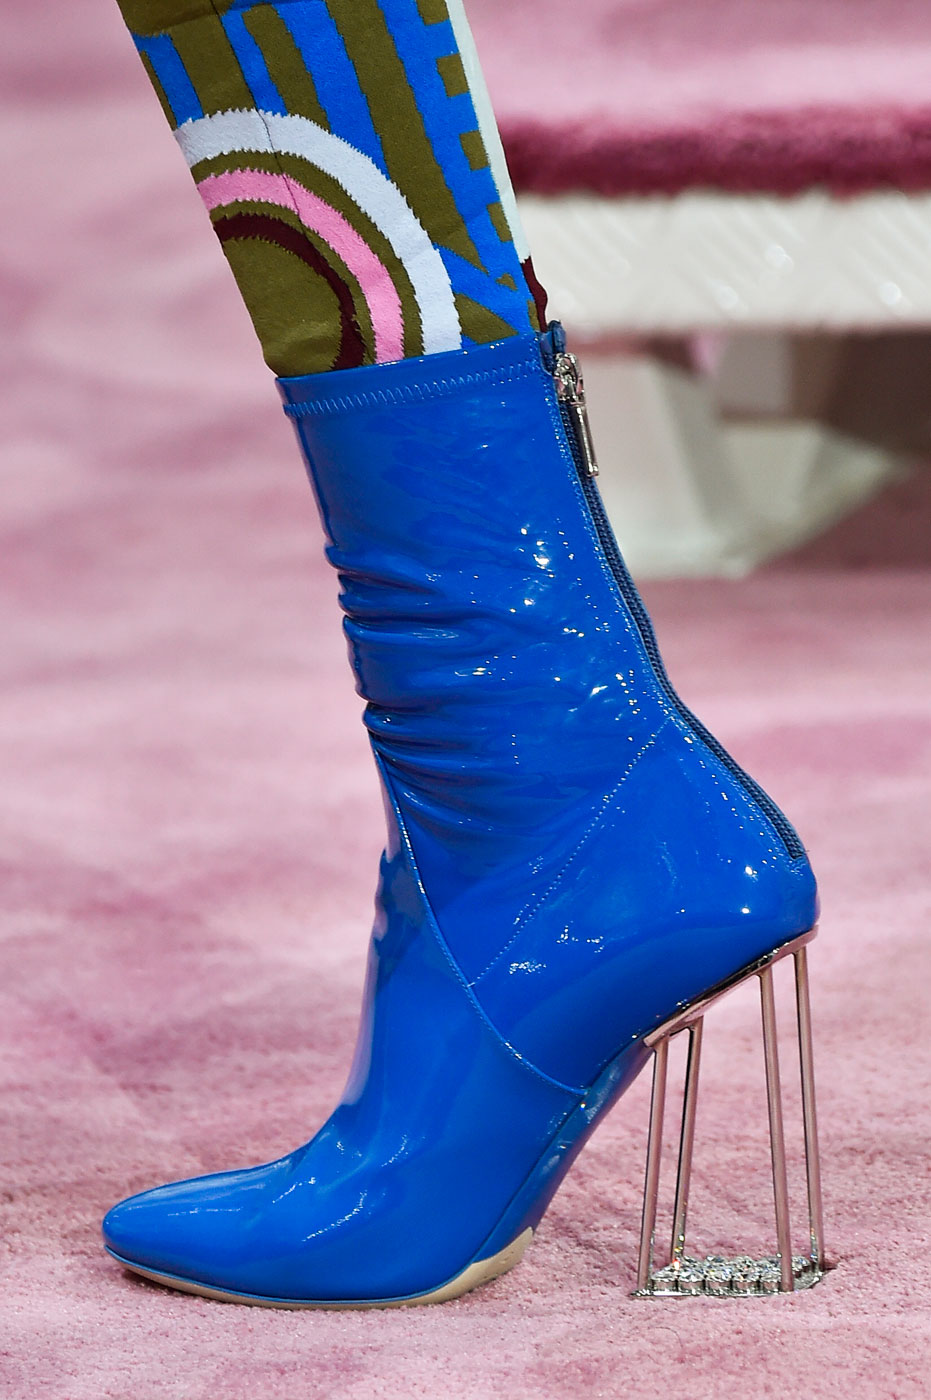 Christian-Dior-fashion-runway-show-close-ups-haute-couture-paris-spring-summer-2015-the-impression-105